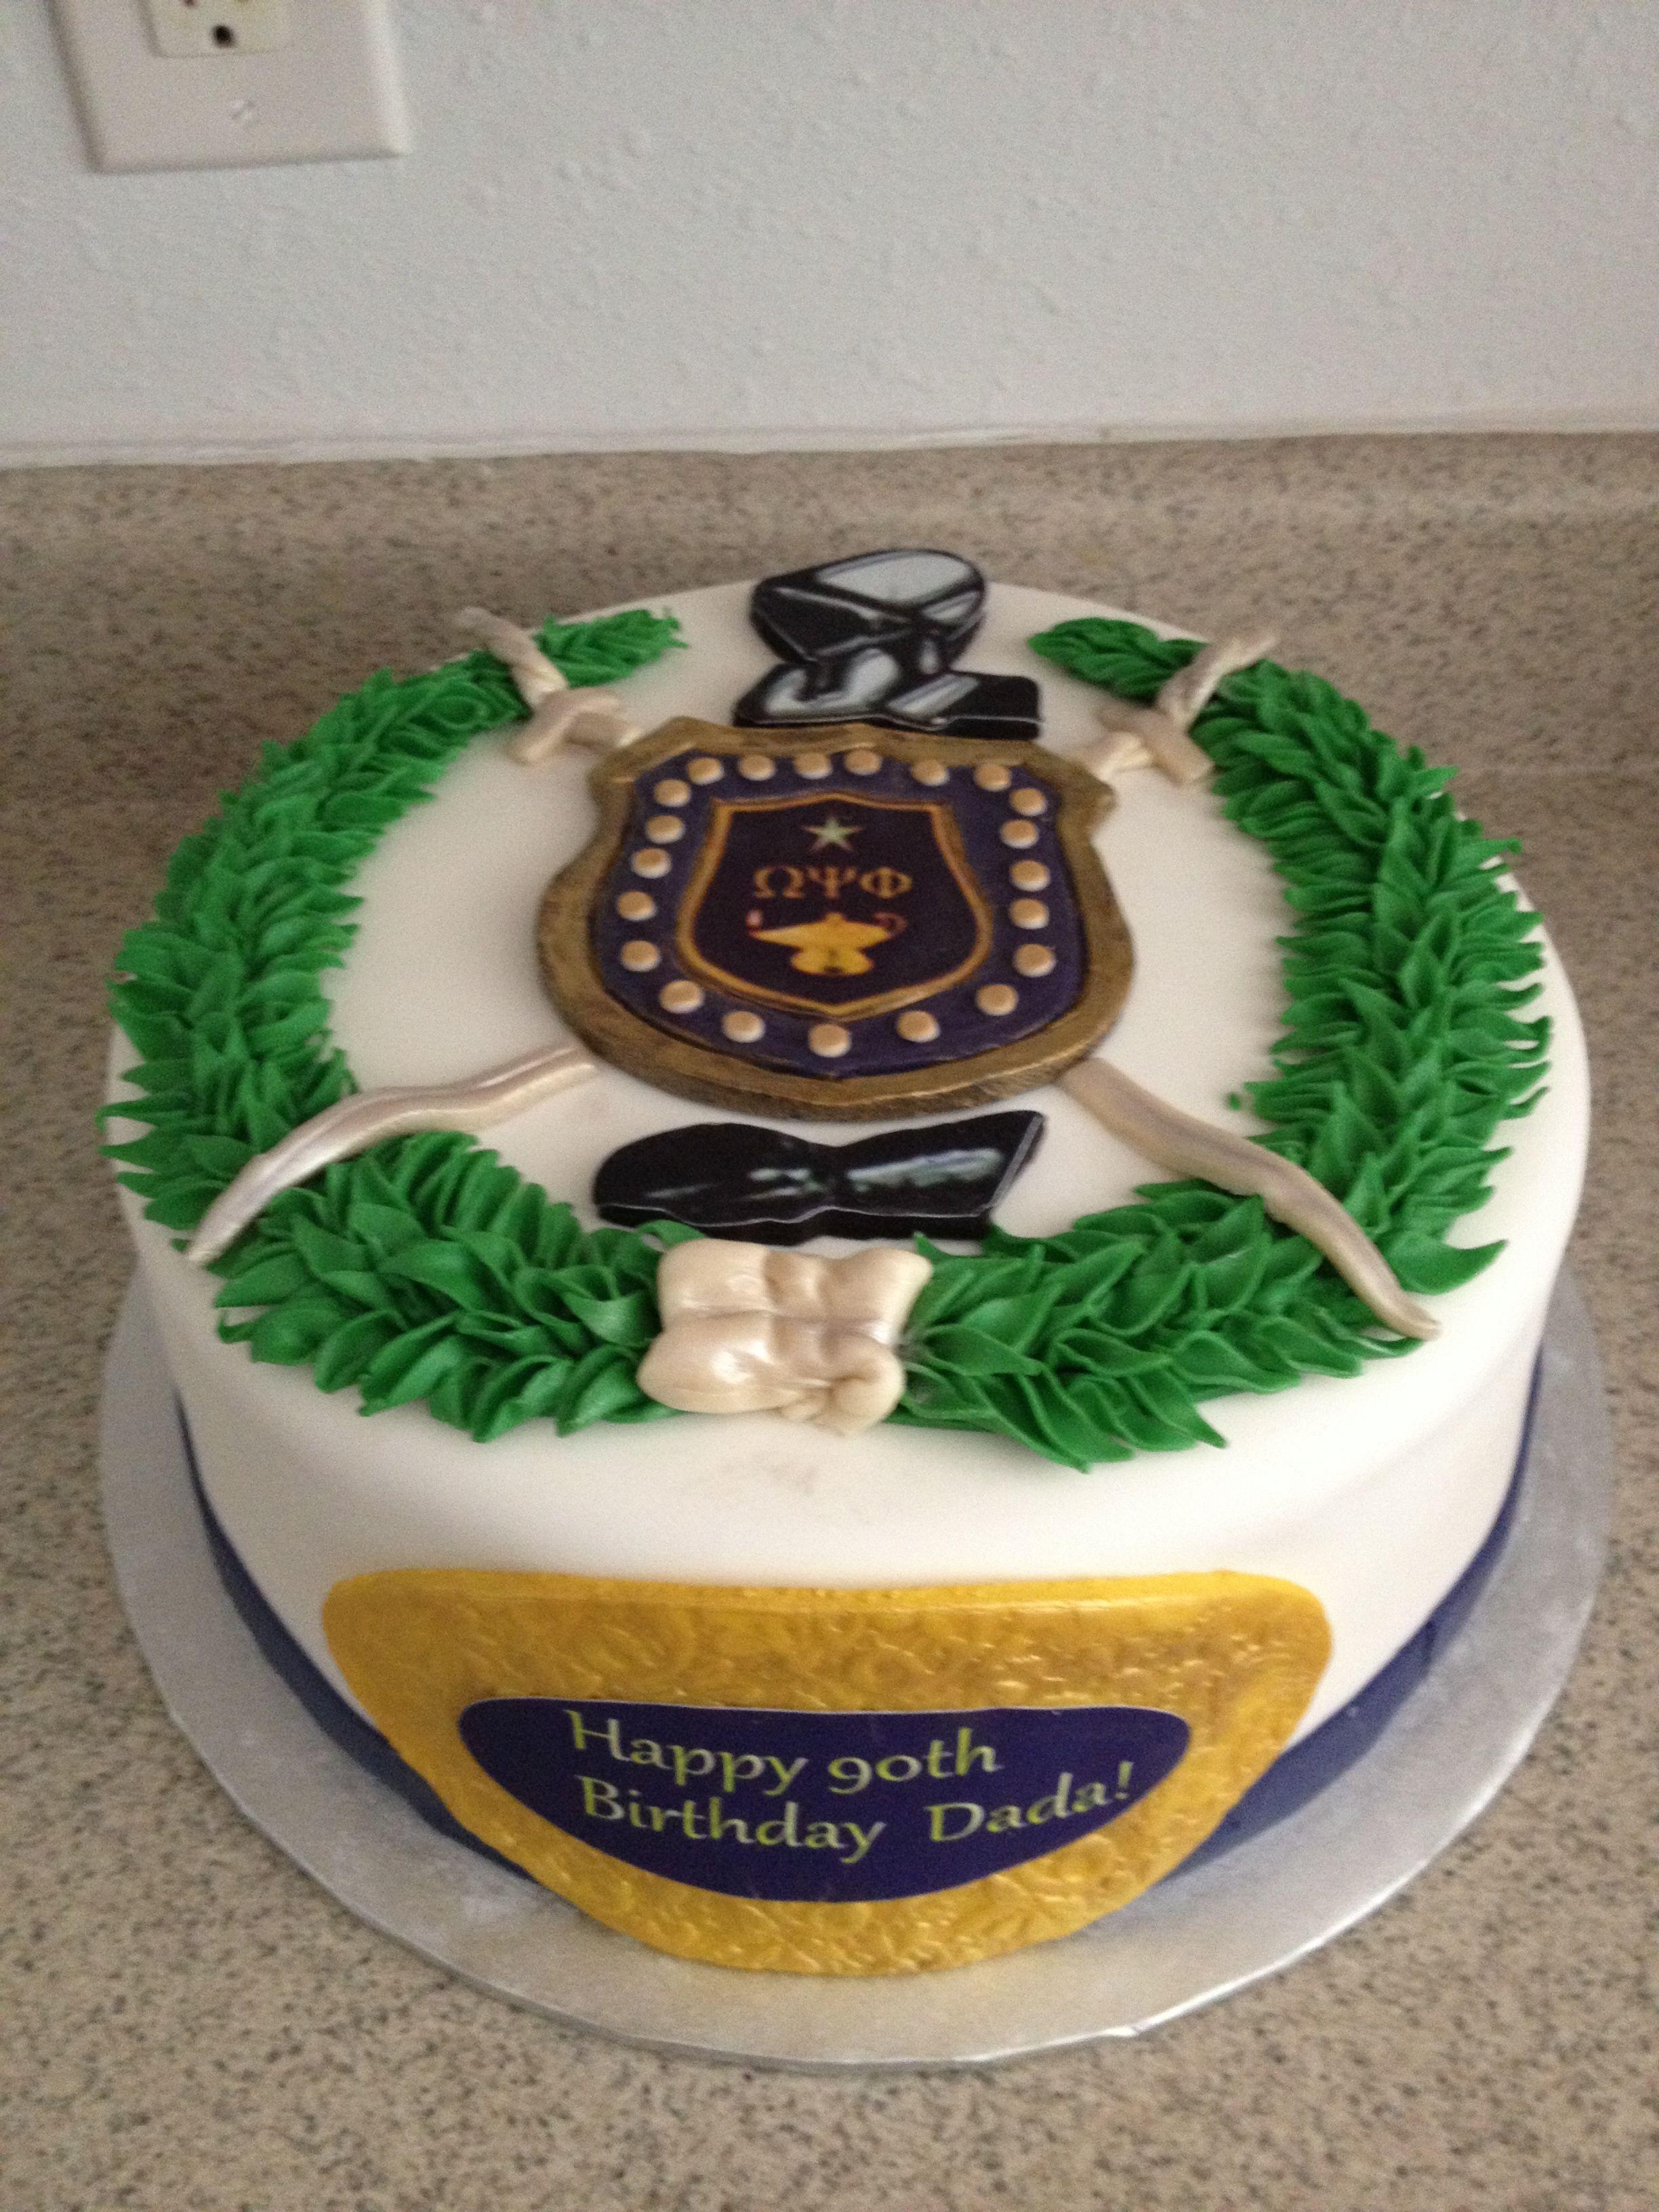 Omega Psi Phi Cake Cakes Pinterest Omega Psi Phi Omega And